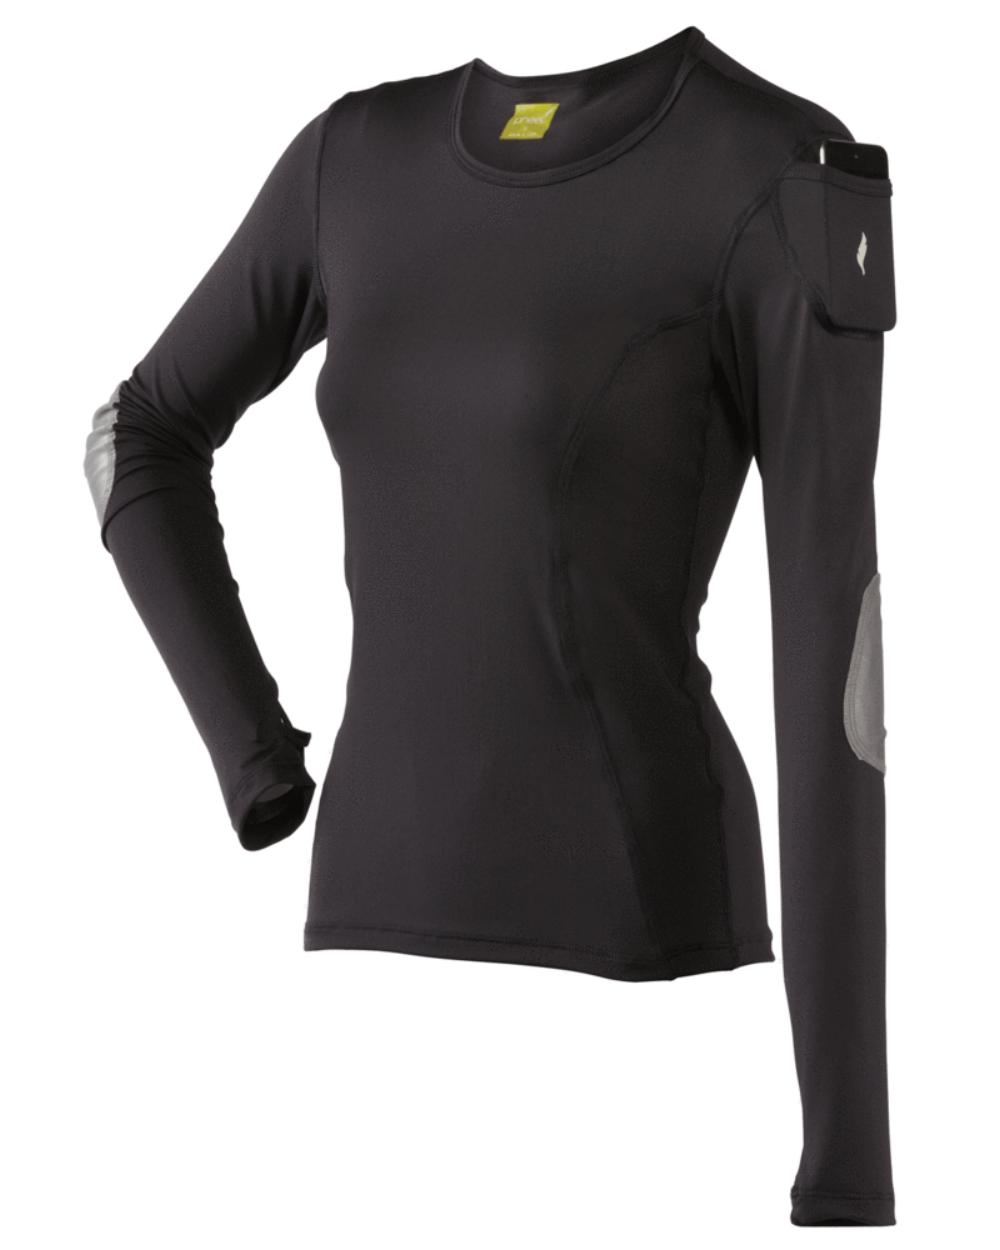 2015 Pheel Black Vital Layer Shirt